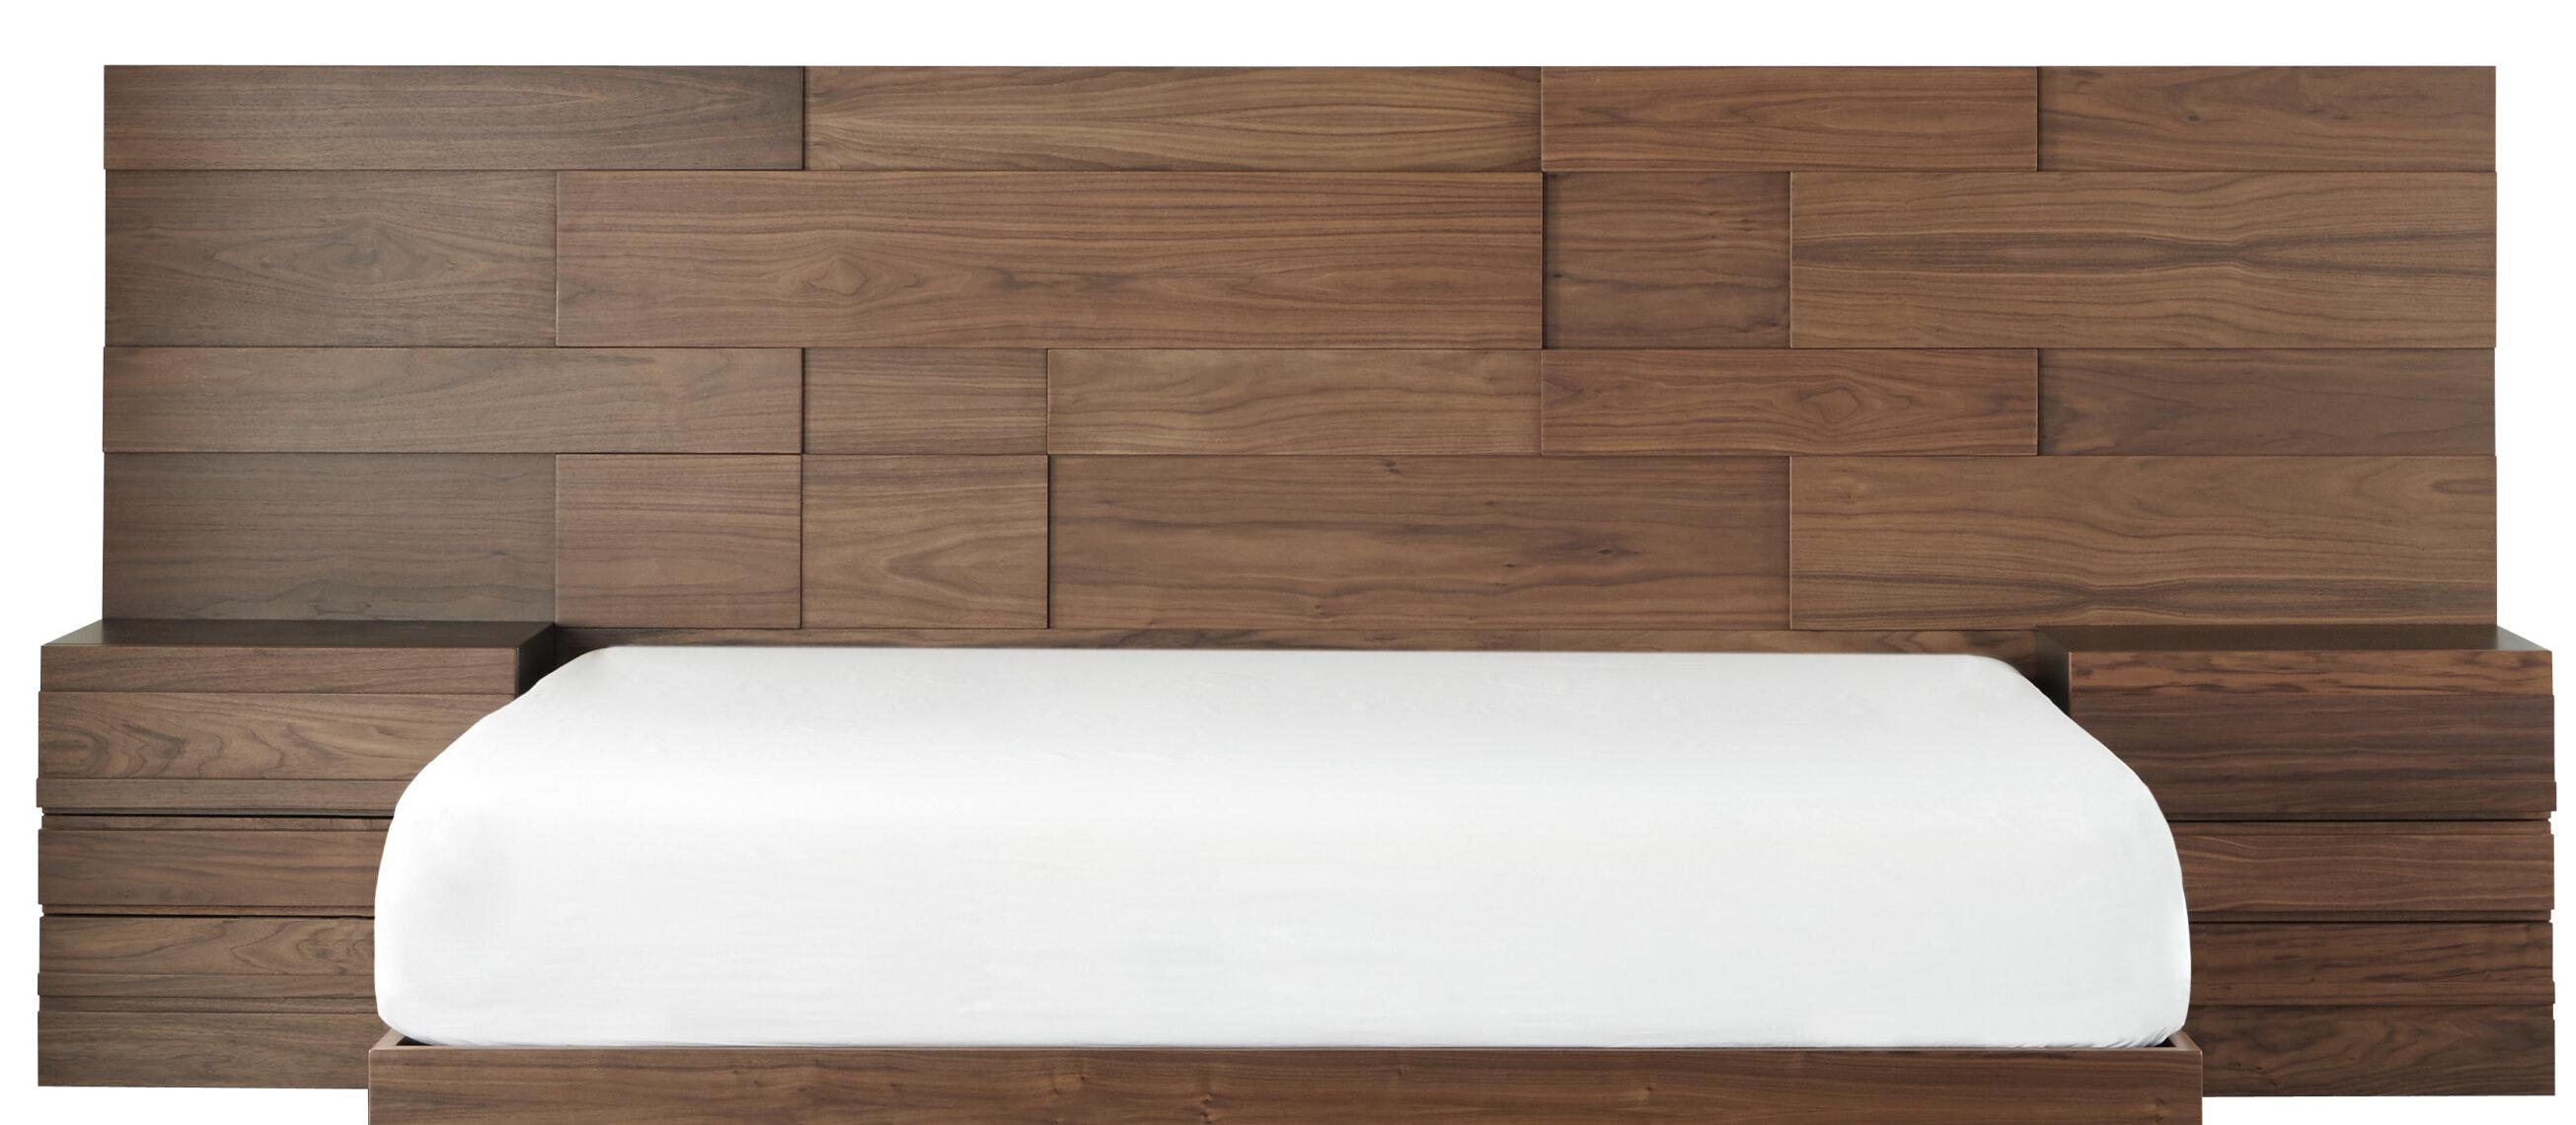 Corrigan Studio Walnut Wood King Size Headboard Extensions 23 6 X 31 5 Wayfair Ca